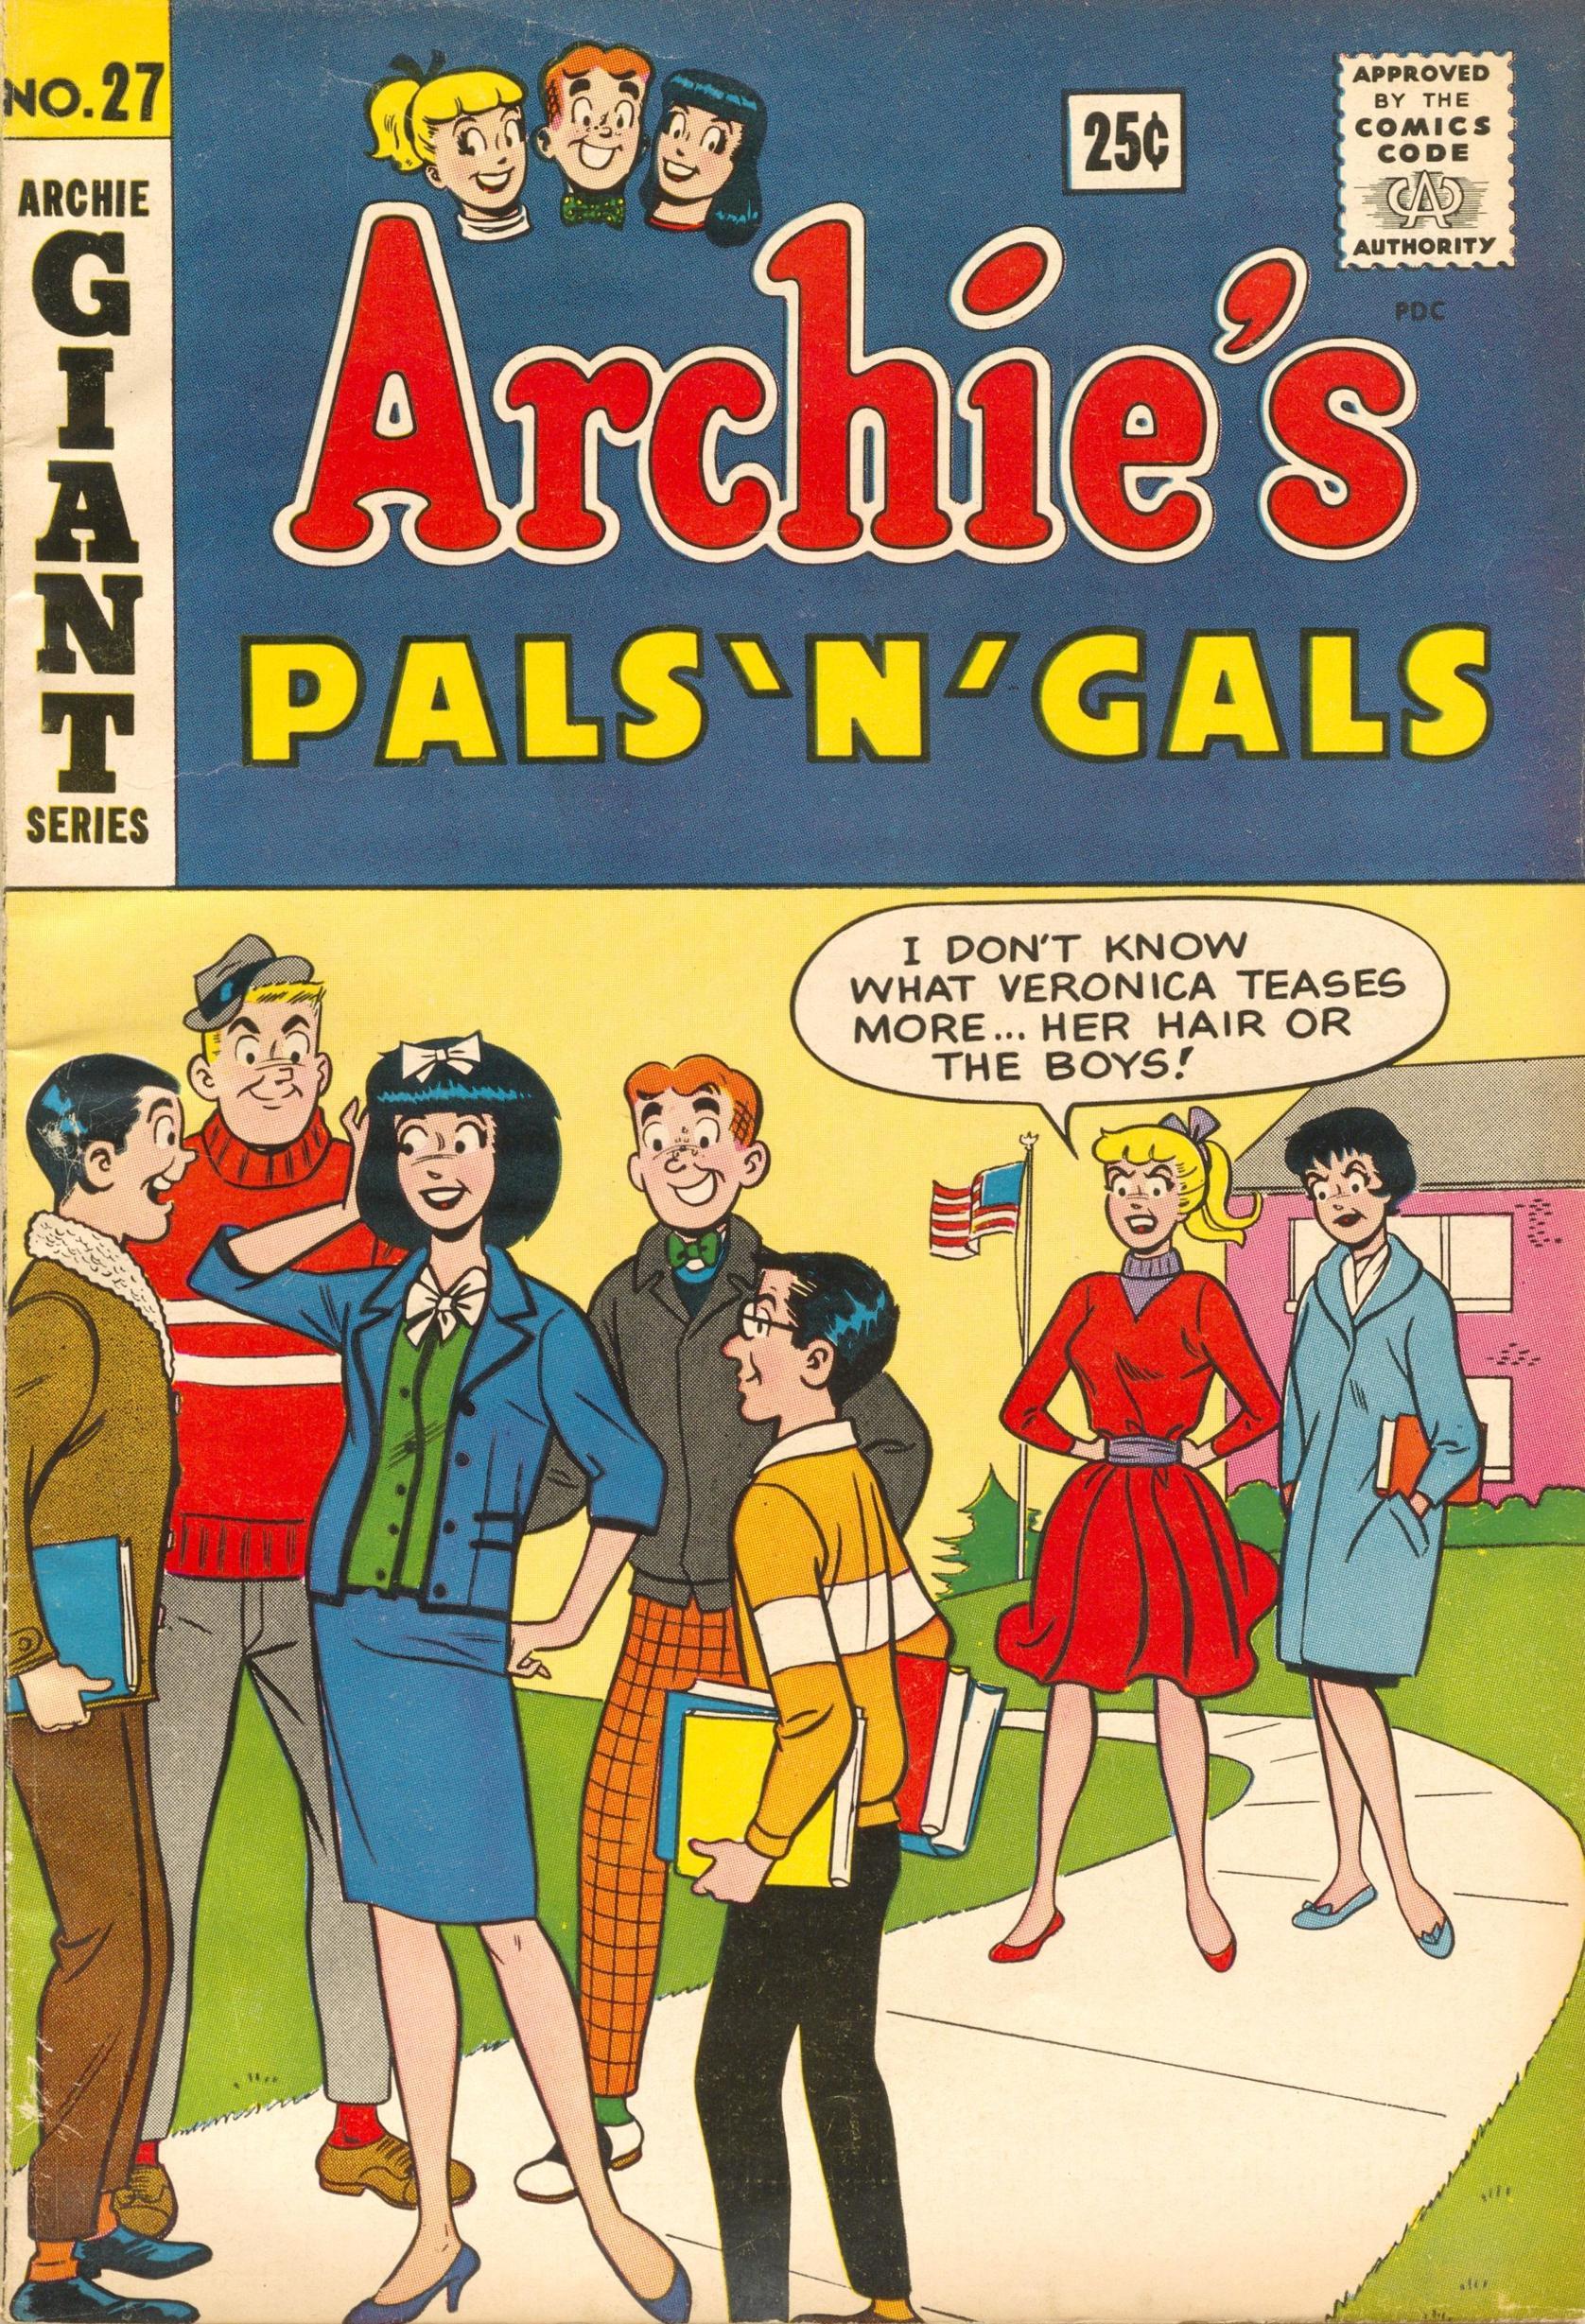 Archies Pals n Gals 027 1963